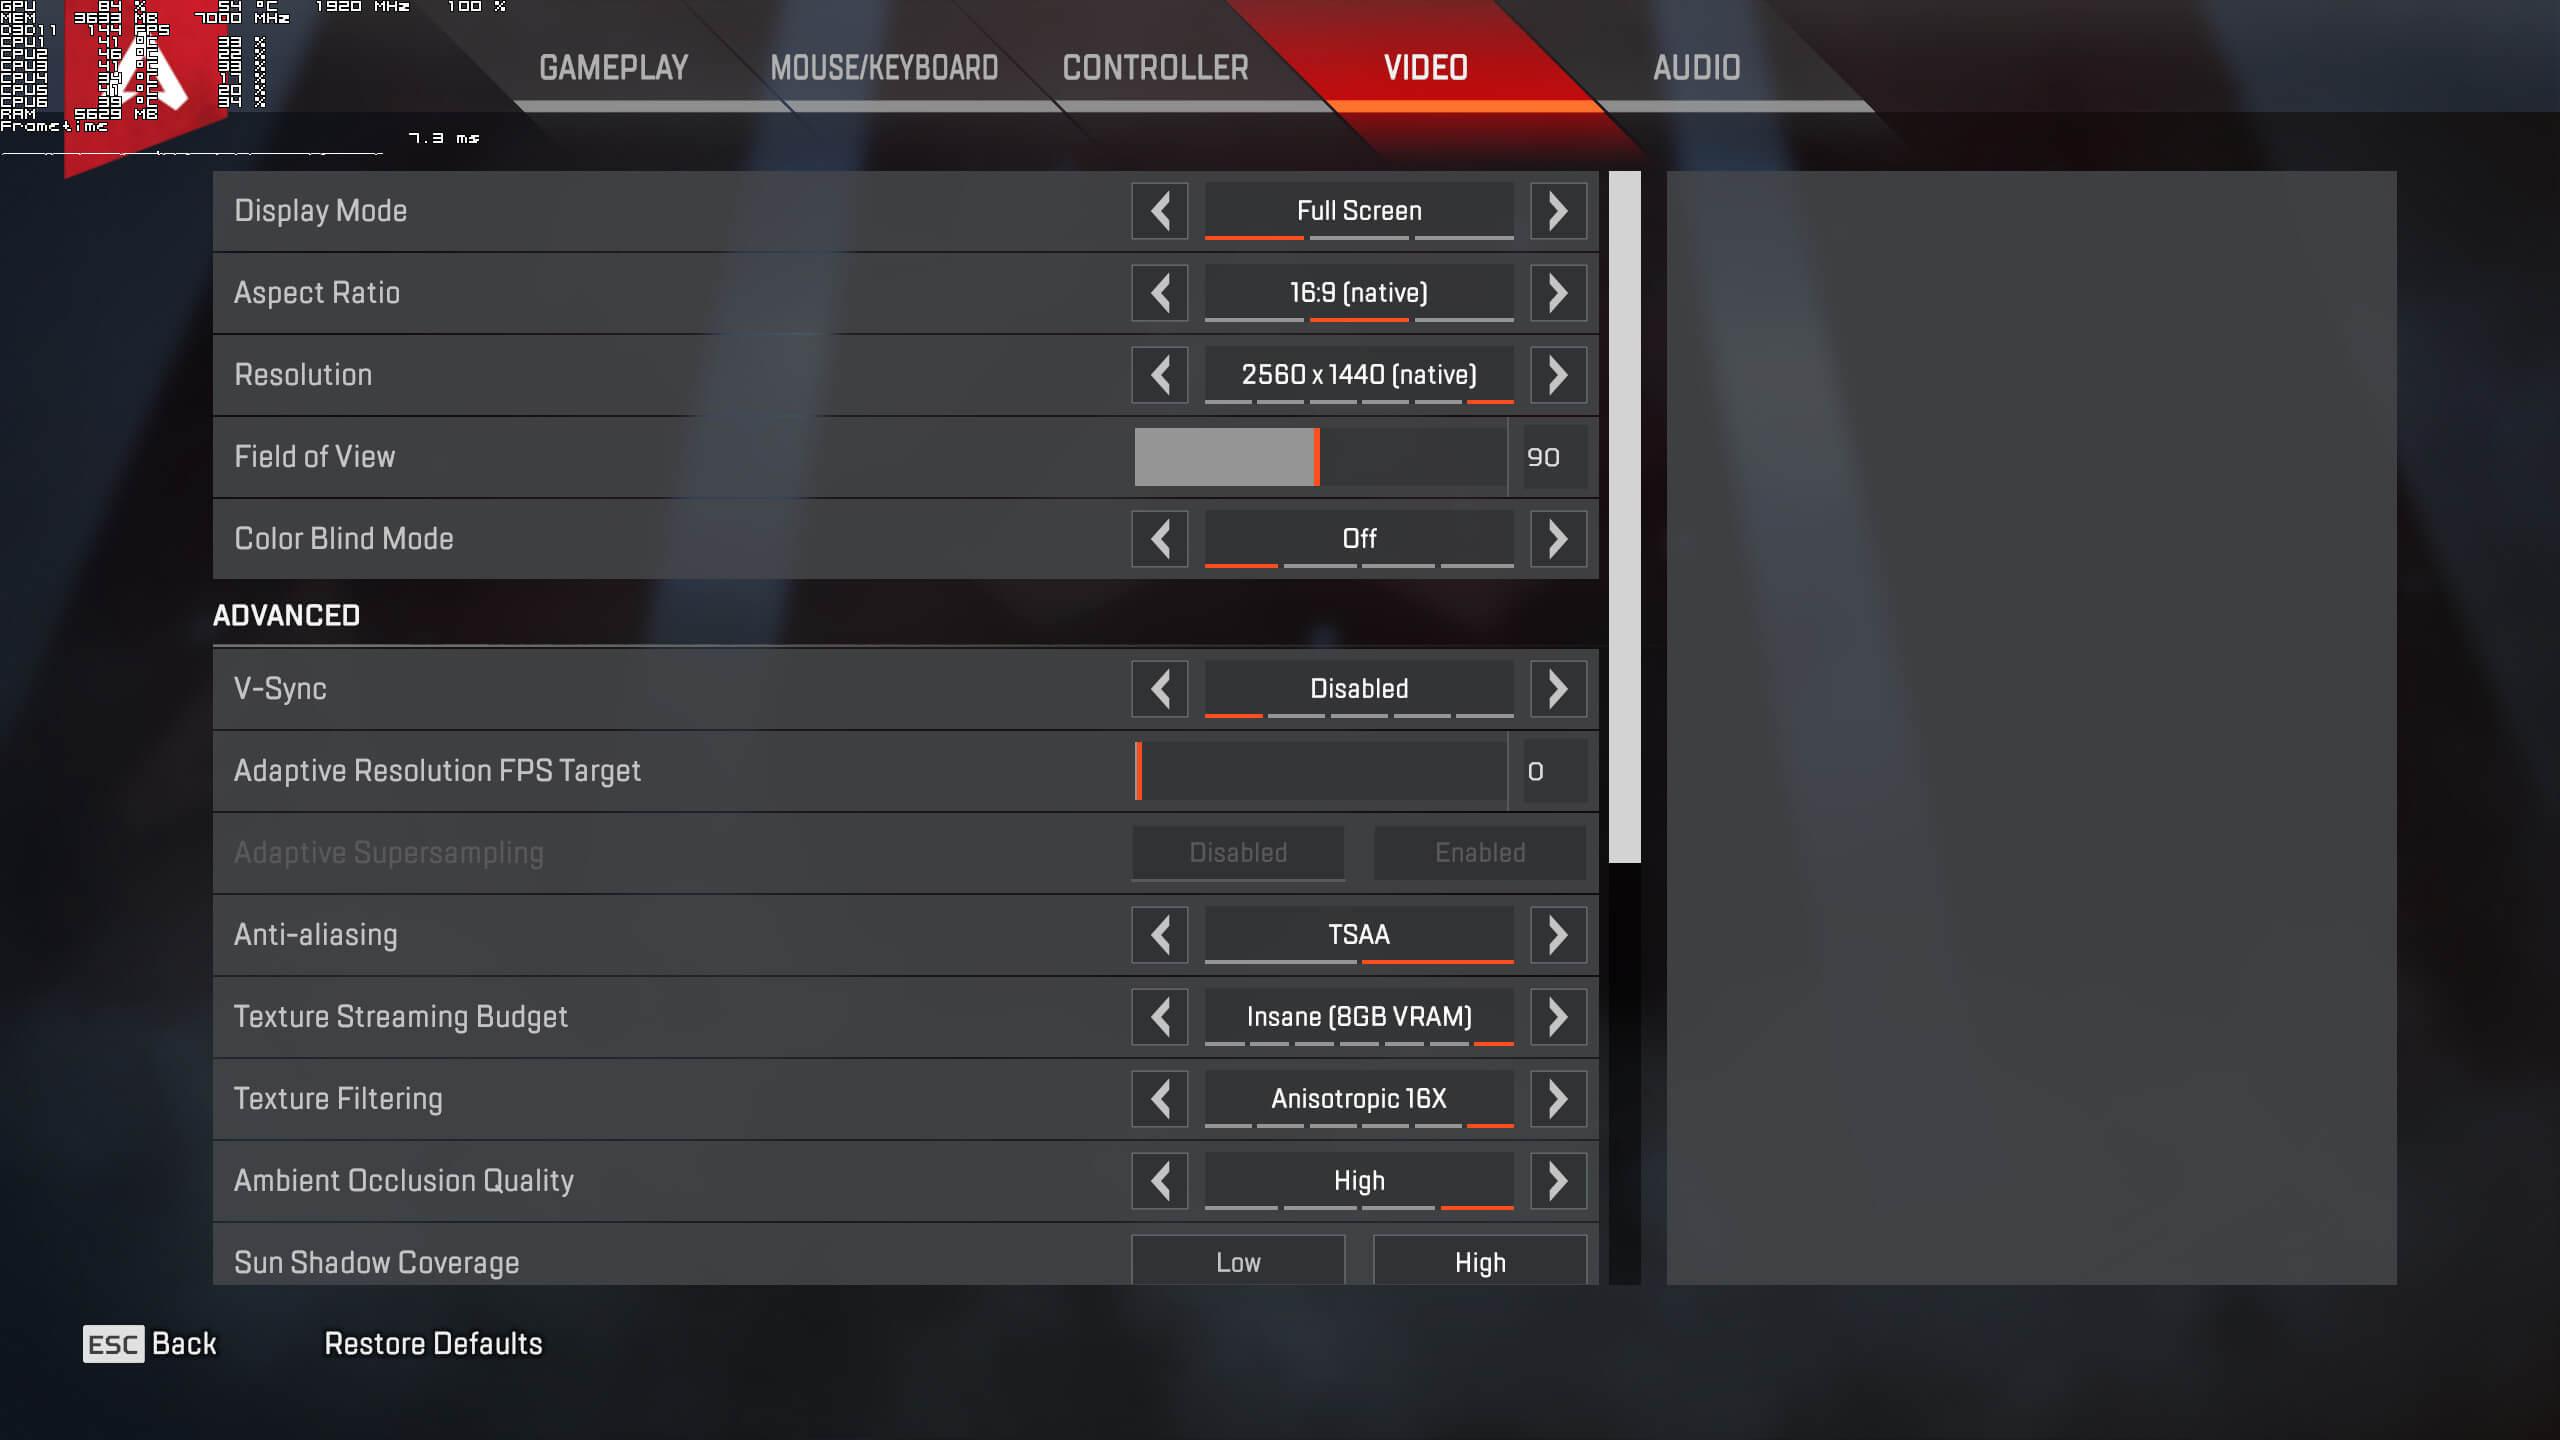 Apex Legends PC Performance Analysis - DSOGaming